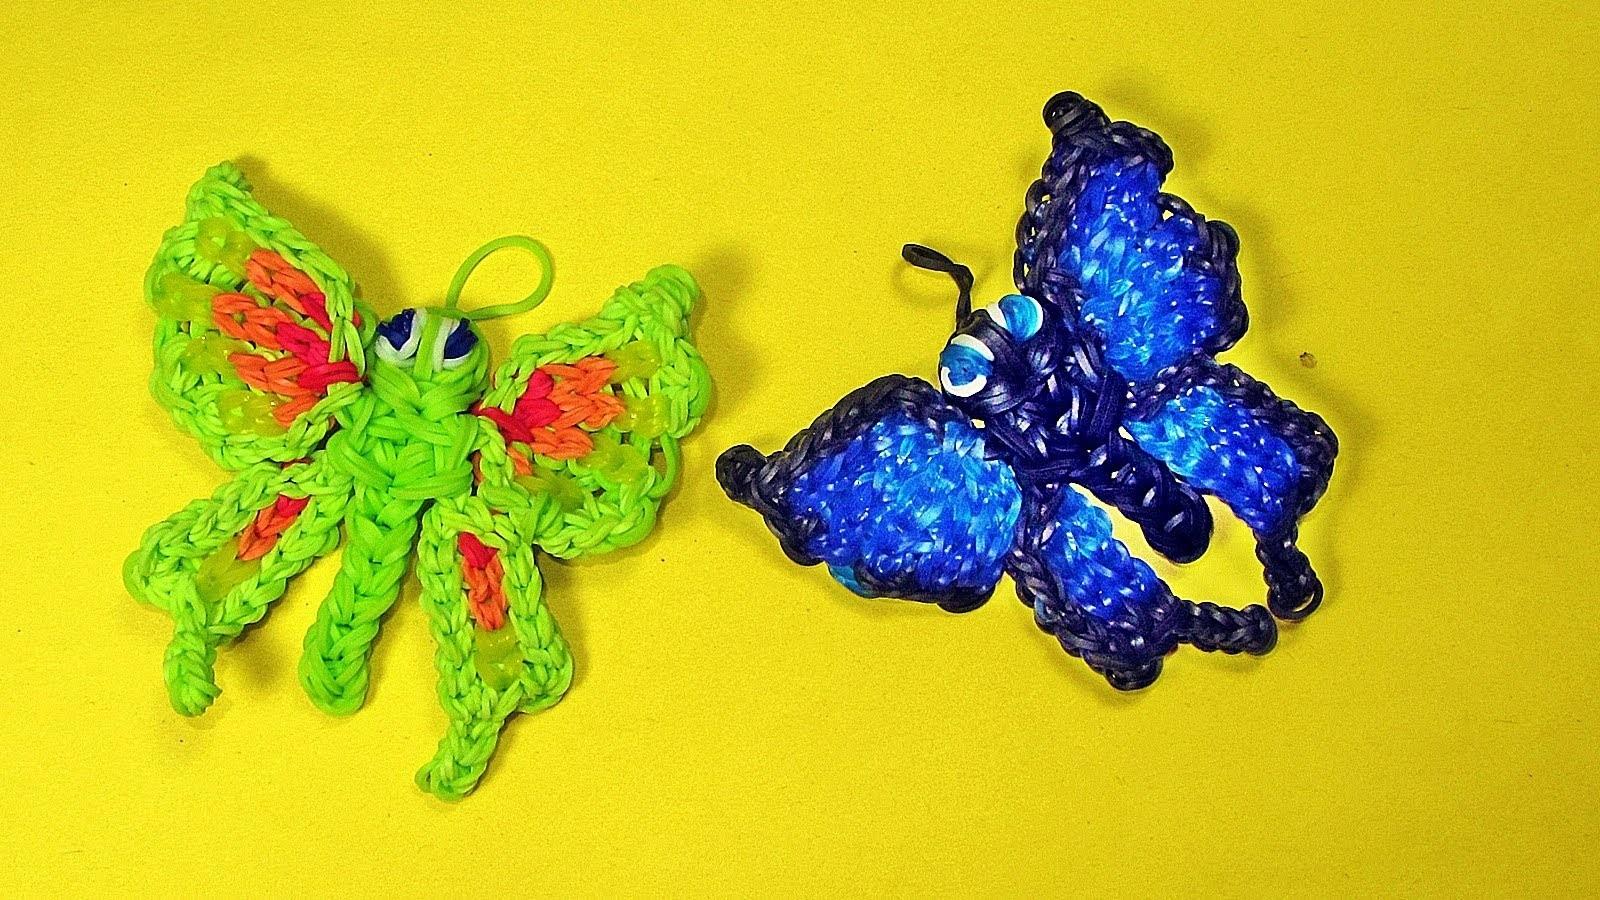 Rainbow Loom Charms Butterfly Tutorial